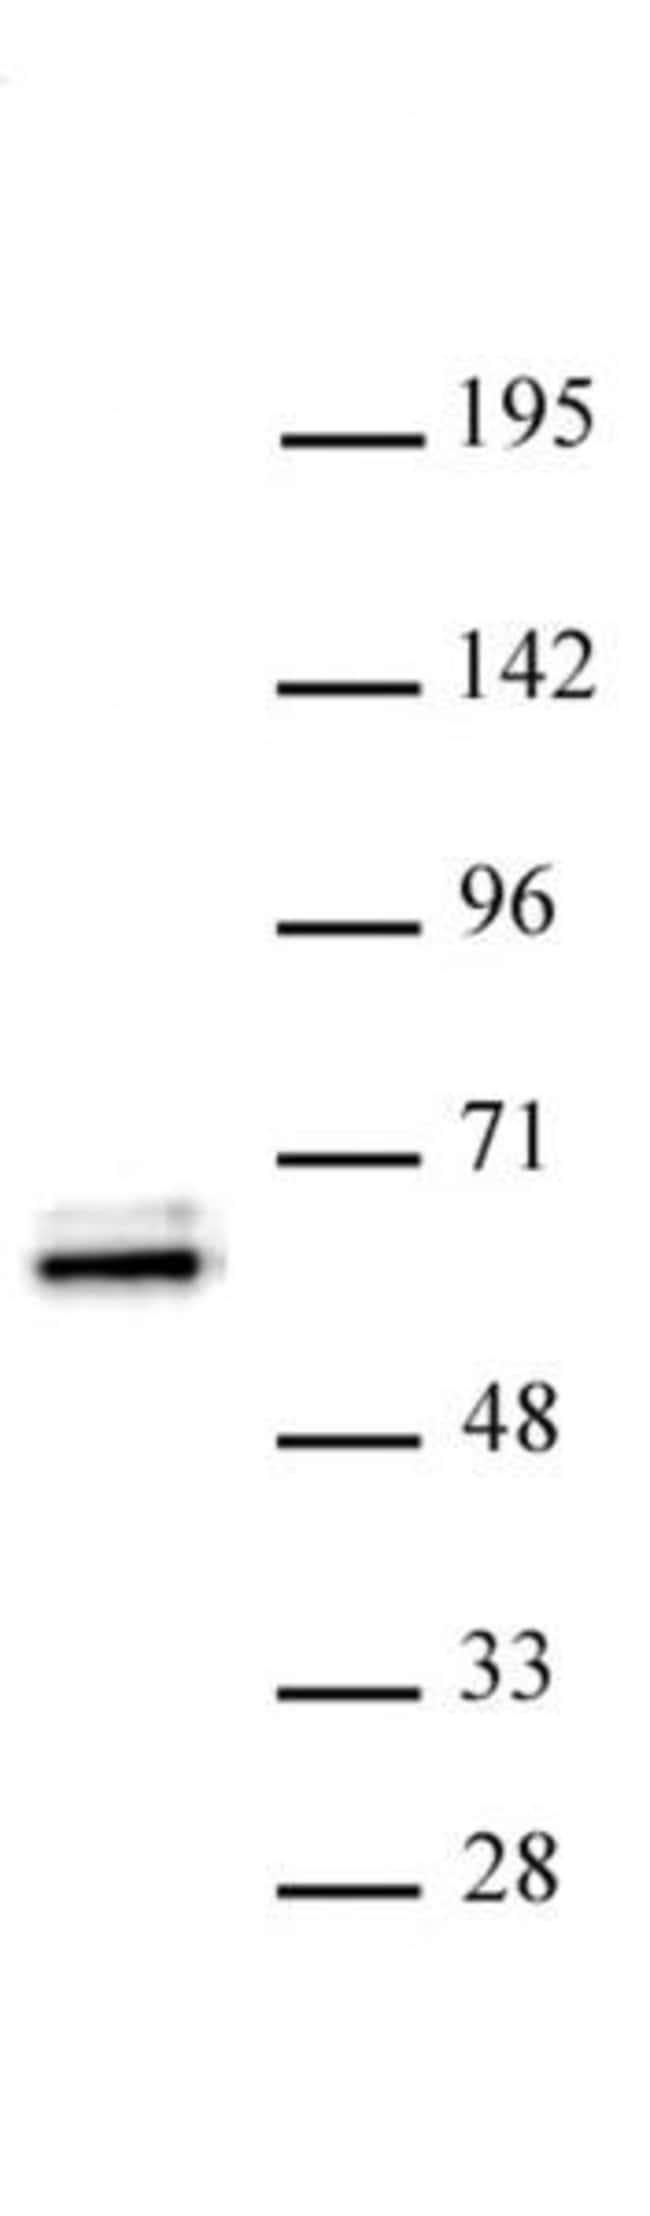 TEAD1 Rabbit anti-Human, Unconjugated, Polyclonal, Active Motif:Antibodies:Primary